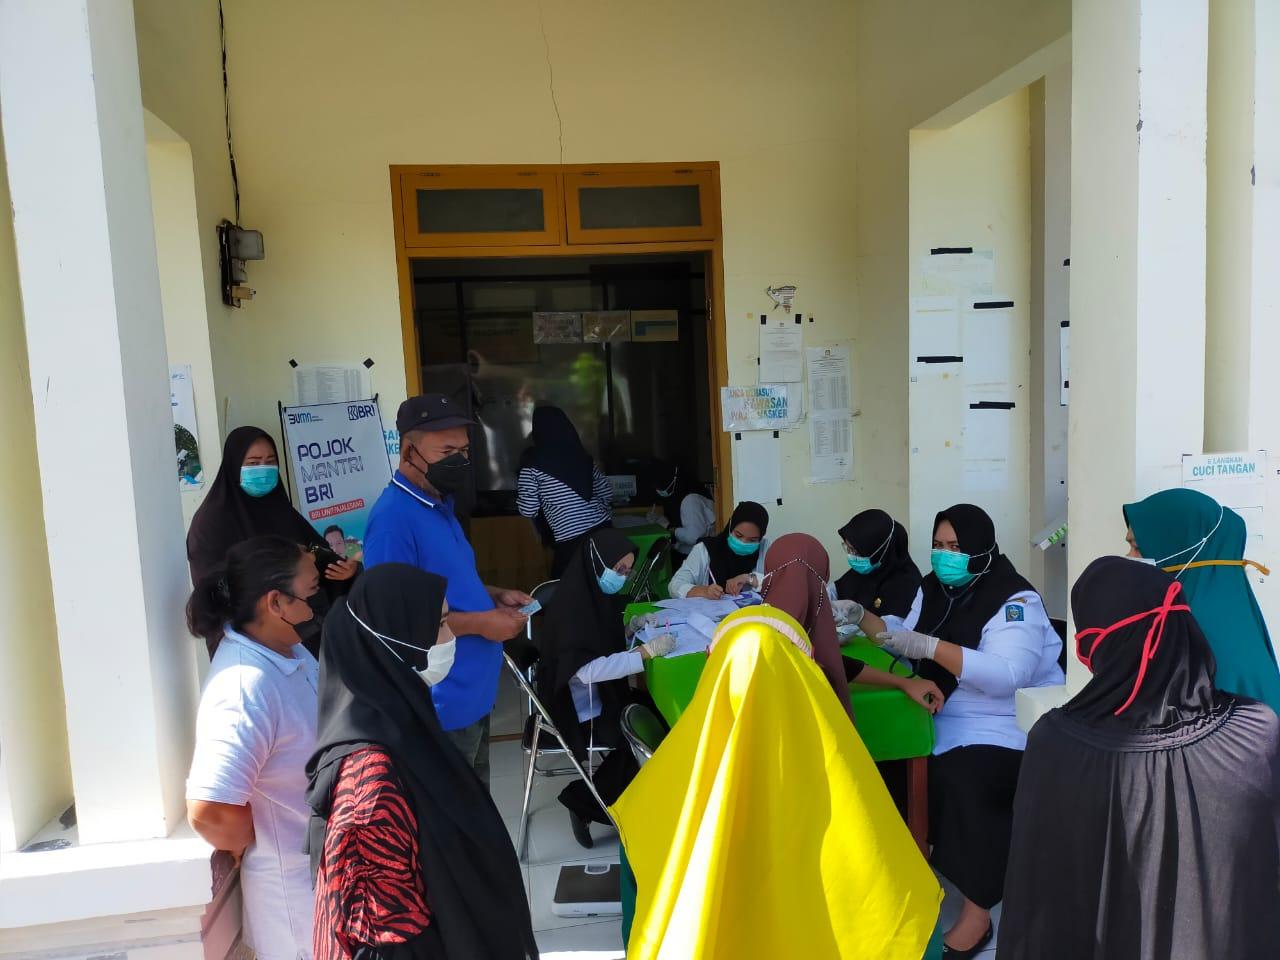 Kantor Kelurahan Macanre Kecamatan Lilirilau Melaksanakan Vaksin Covid -19 Gelombang Ke Dua